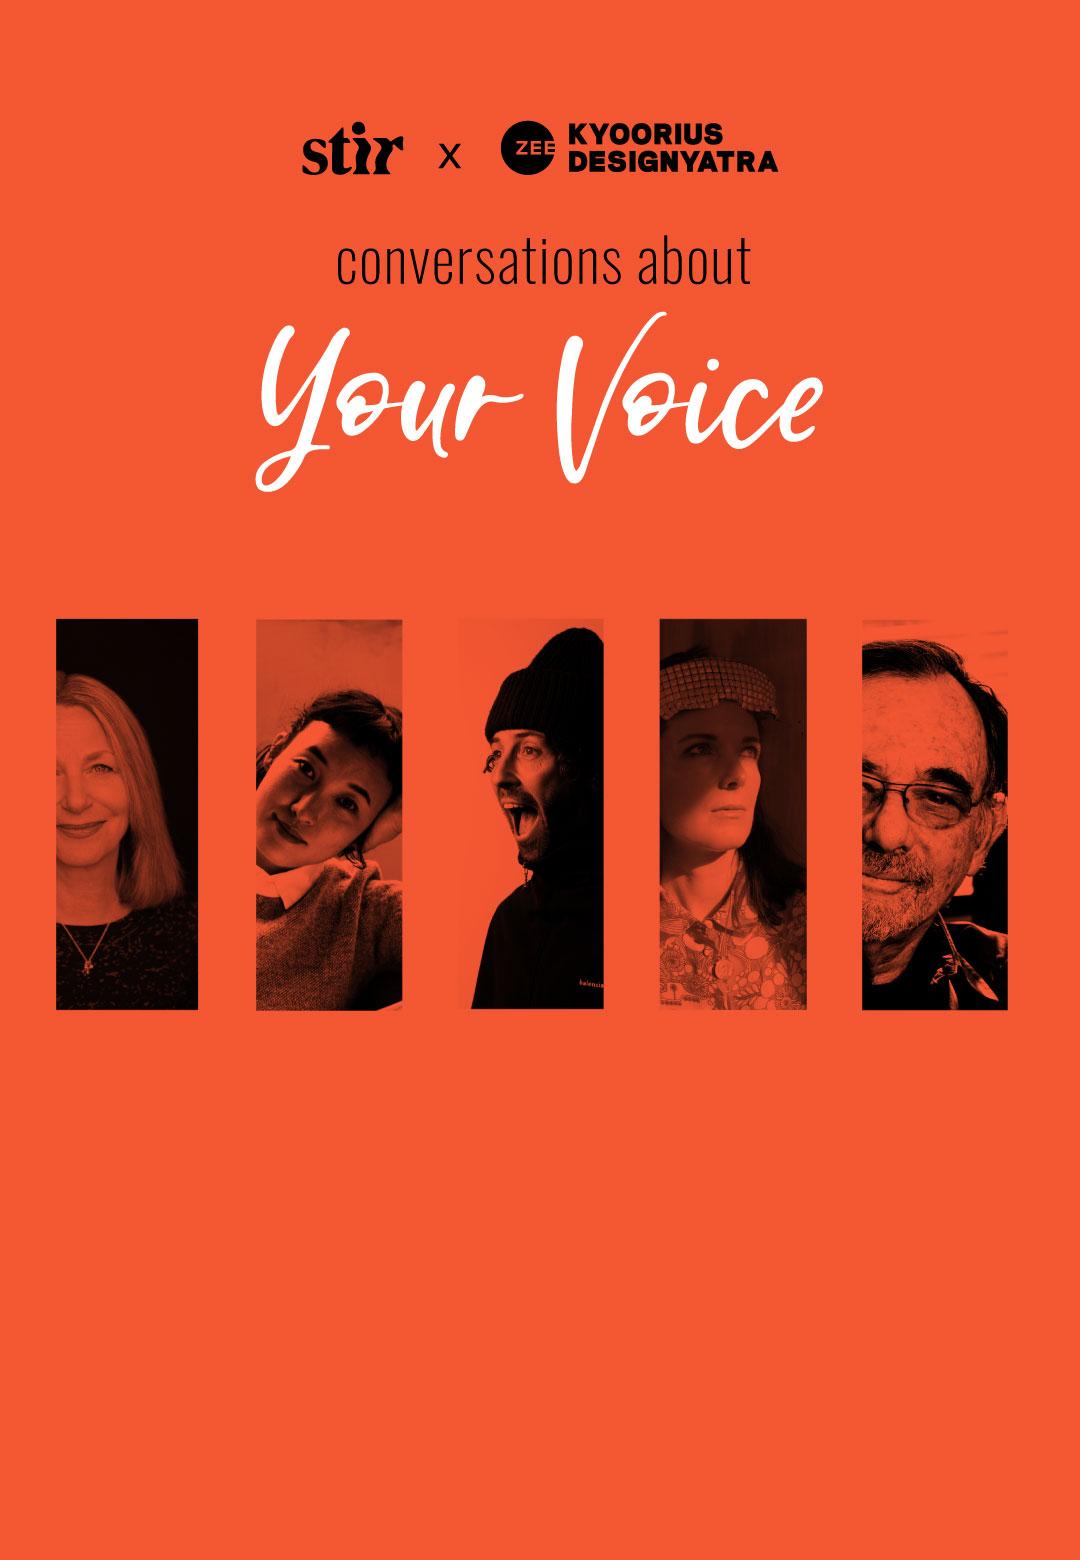 STIR X Kyoorius Designyatra | Conversations About Your Voice | STIRworld